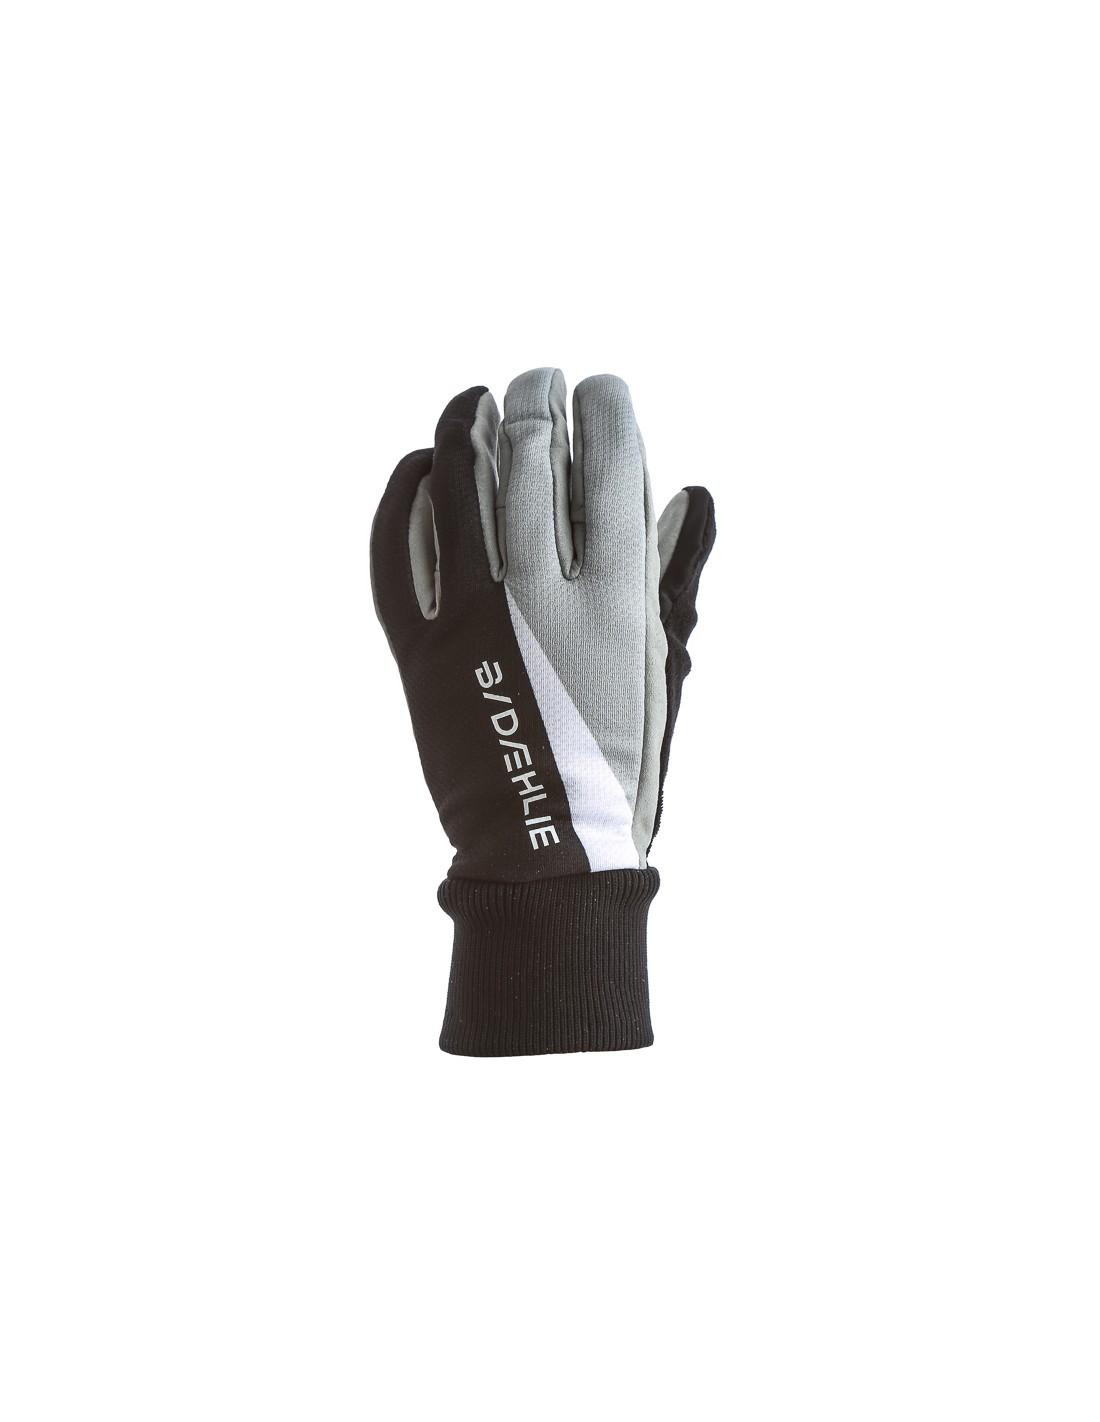 Fingerhansker Bjørn Dæhlie Glove Classic Black SportsDeal! 332810-99900 199 kr